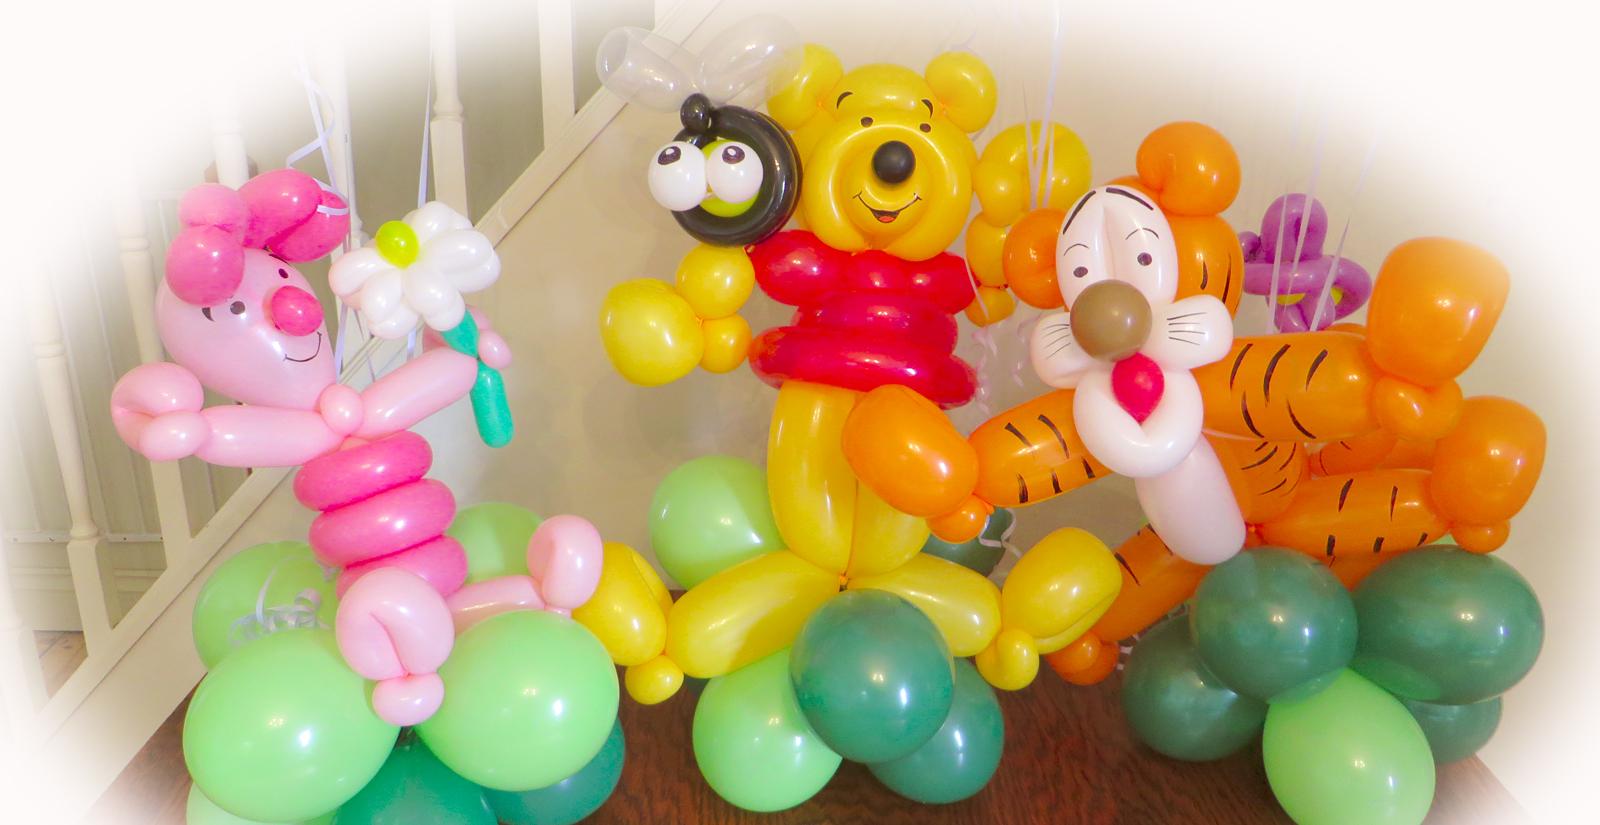 Cute balloony creations